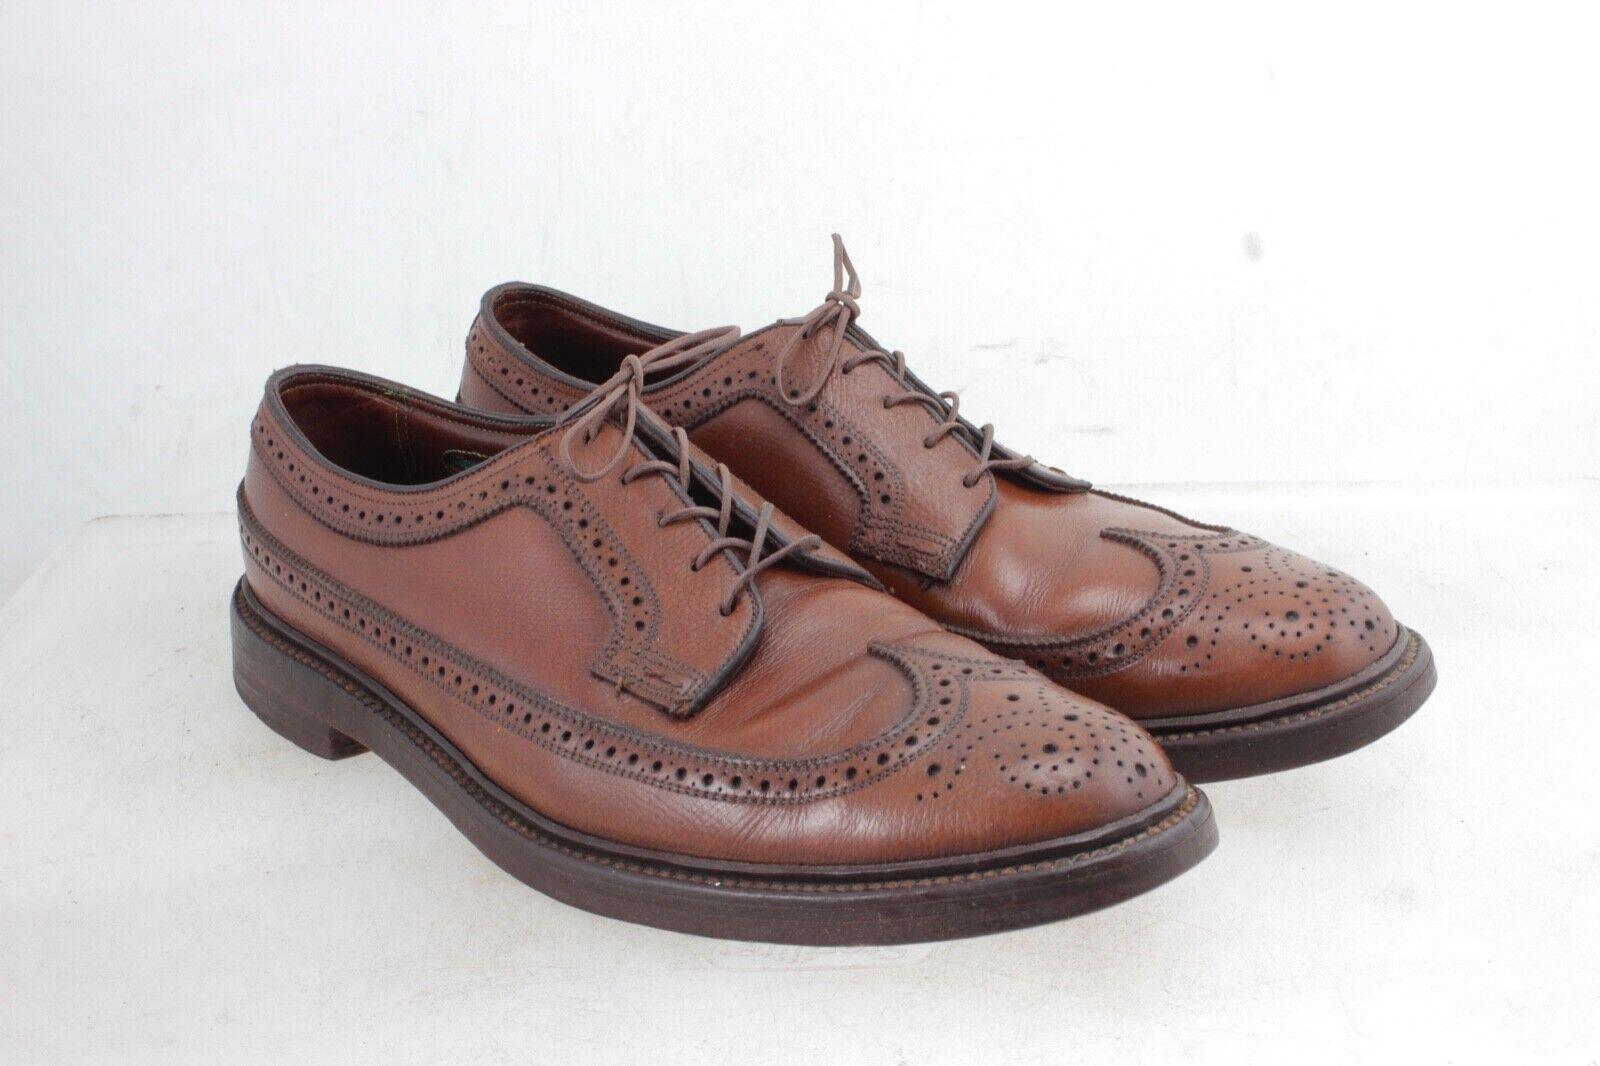 Florsheim Royal Imperial Pebble Grain 5 Nail V Cleat Dress shoes 9.5 B Vintage